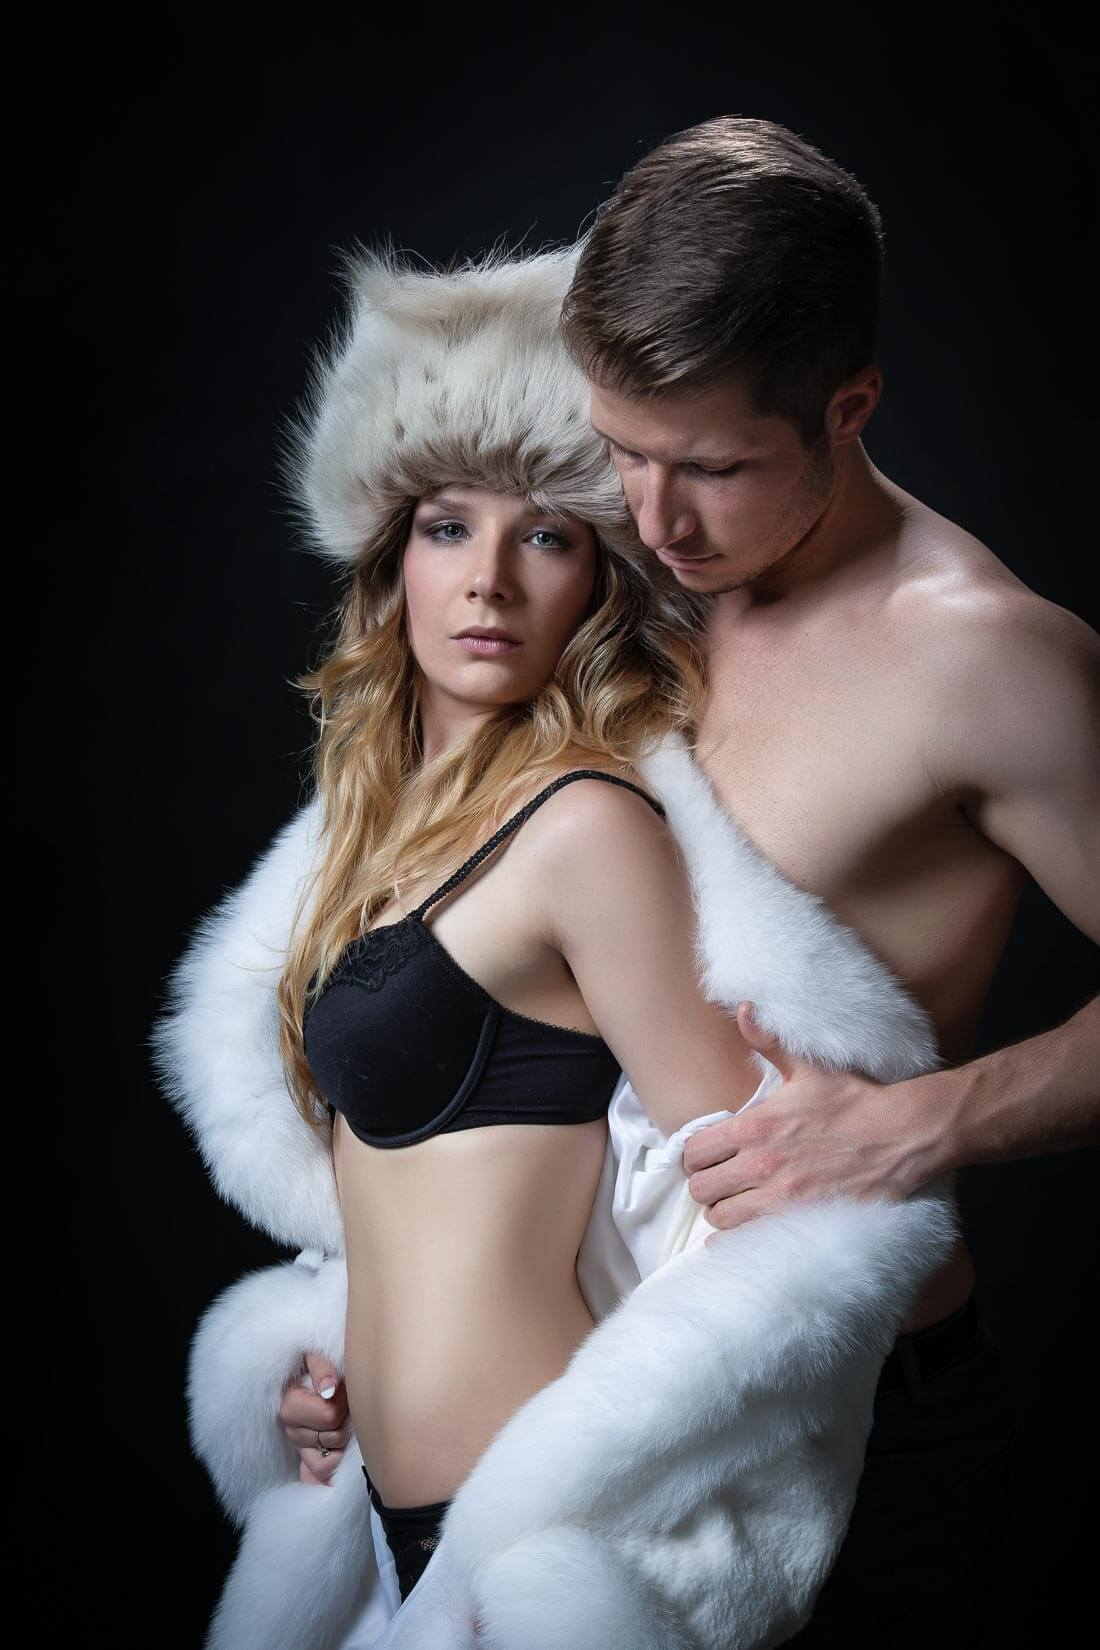 Fotograf-Fotostudio-Dresden-Paar-Shooting-Harmonie-Liebe-Erotik-Dessous-Augenblicke-Berührungen-Szenen